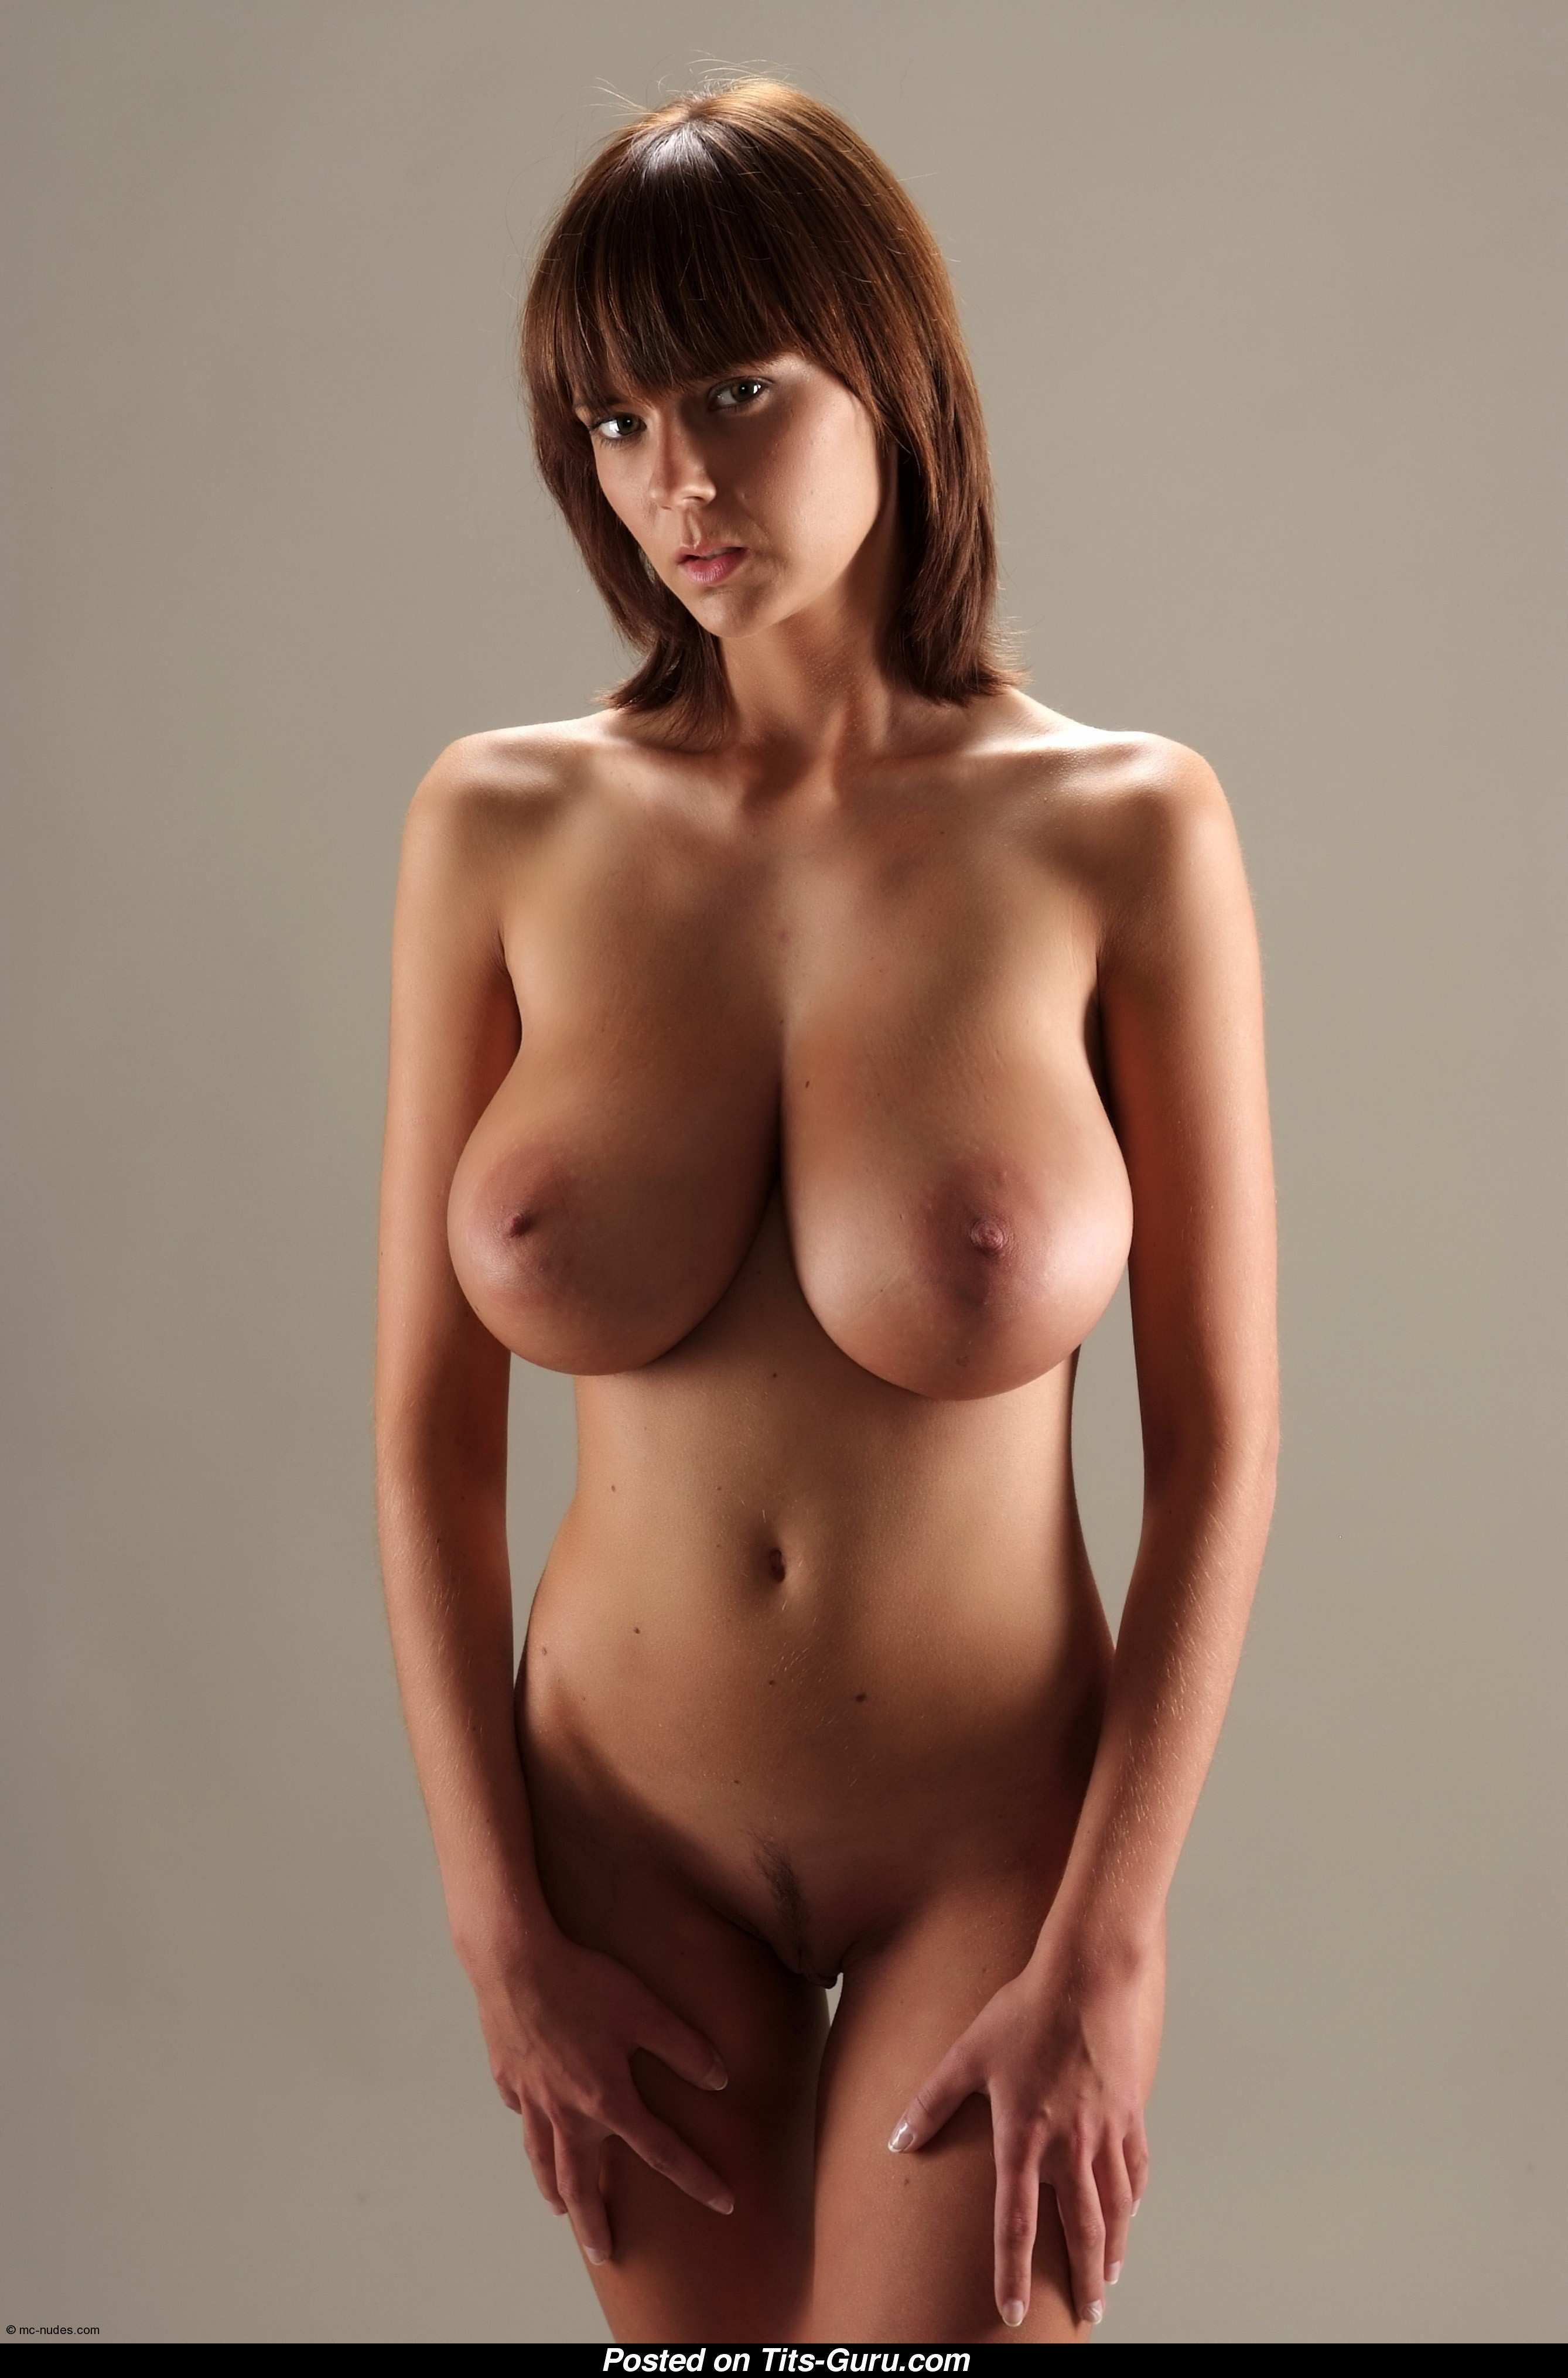 Karin Spolnikova Aka Gabrielle - Sexy Naked Brunette With -4163